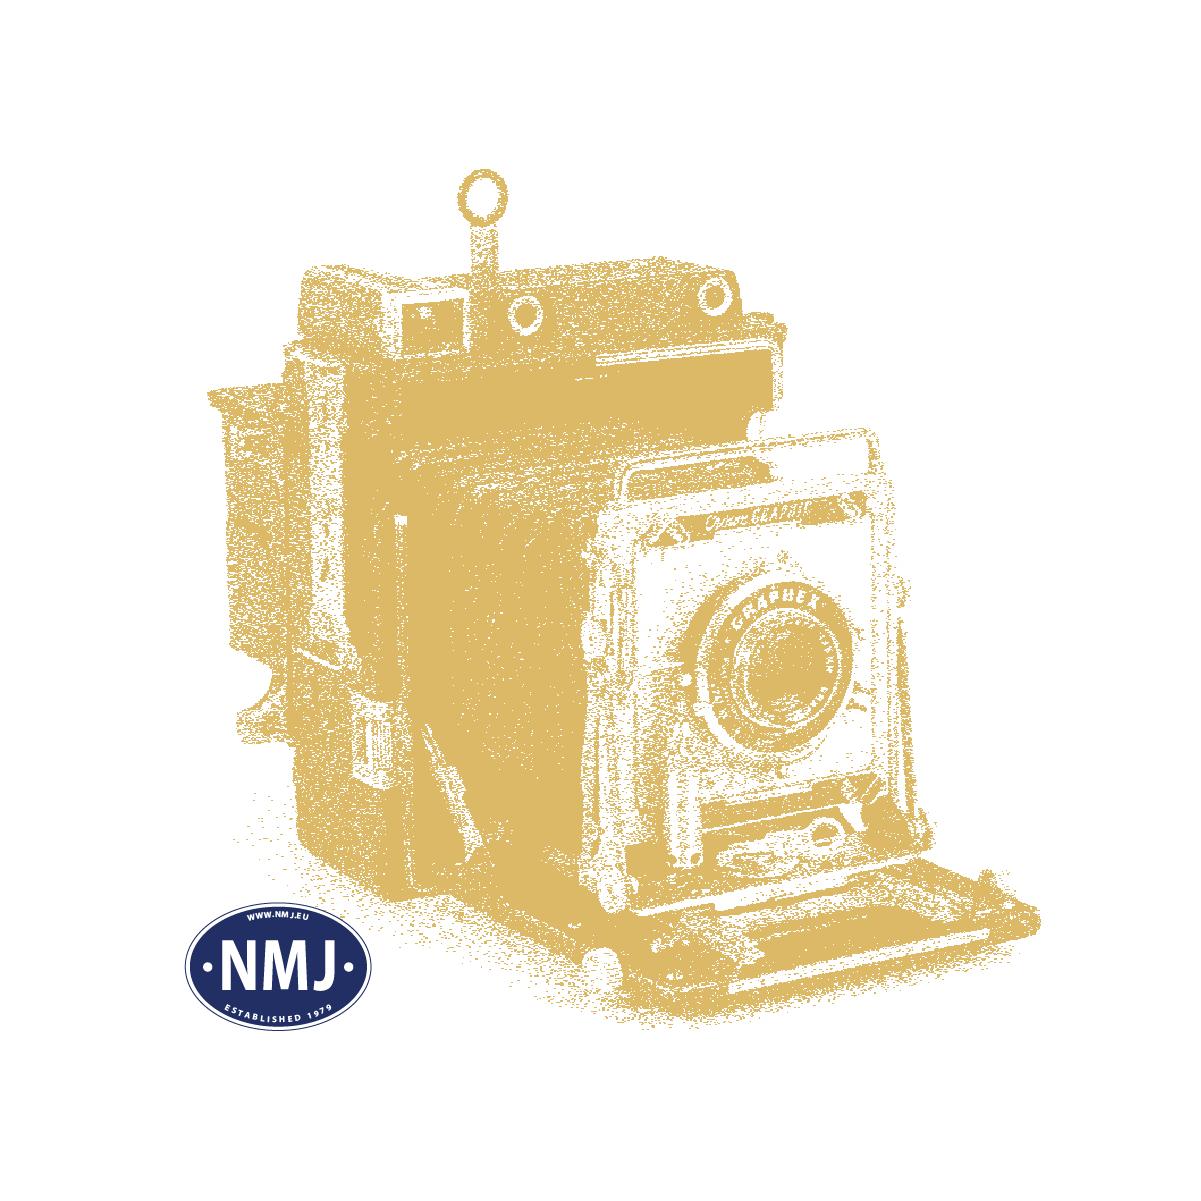 "SPM41200125 - Airbrush Quick-connect, Hunn, 1/8"""